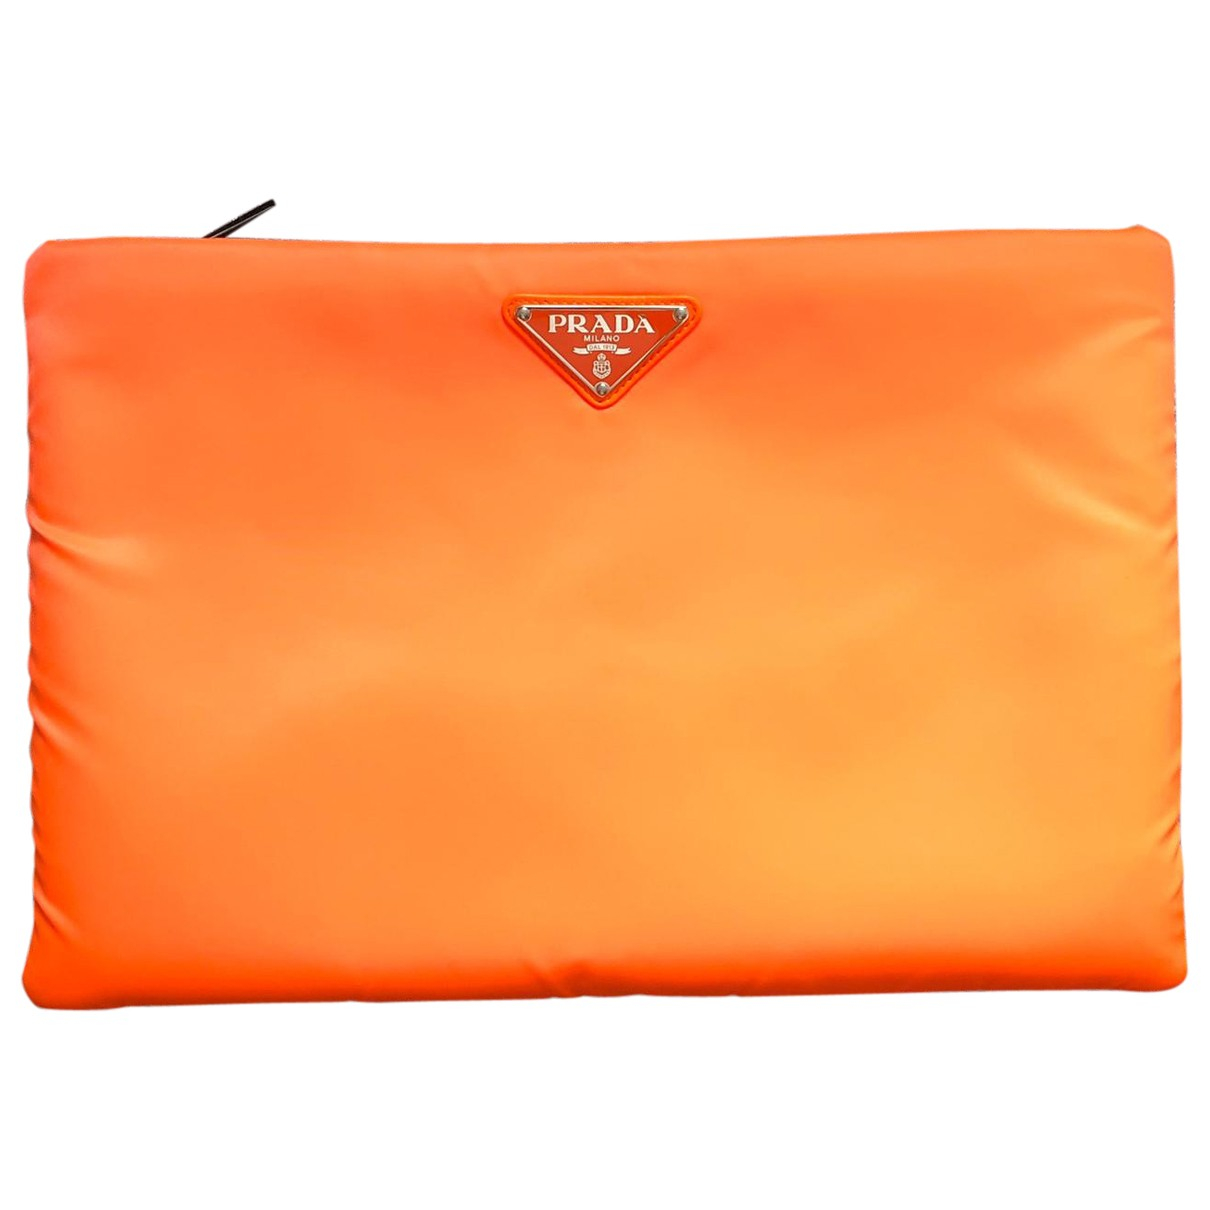 Prada \N Clutch in  Orange Polyester